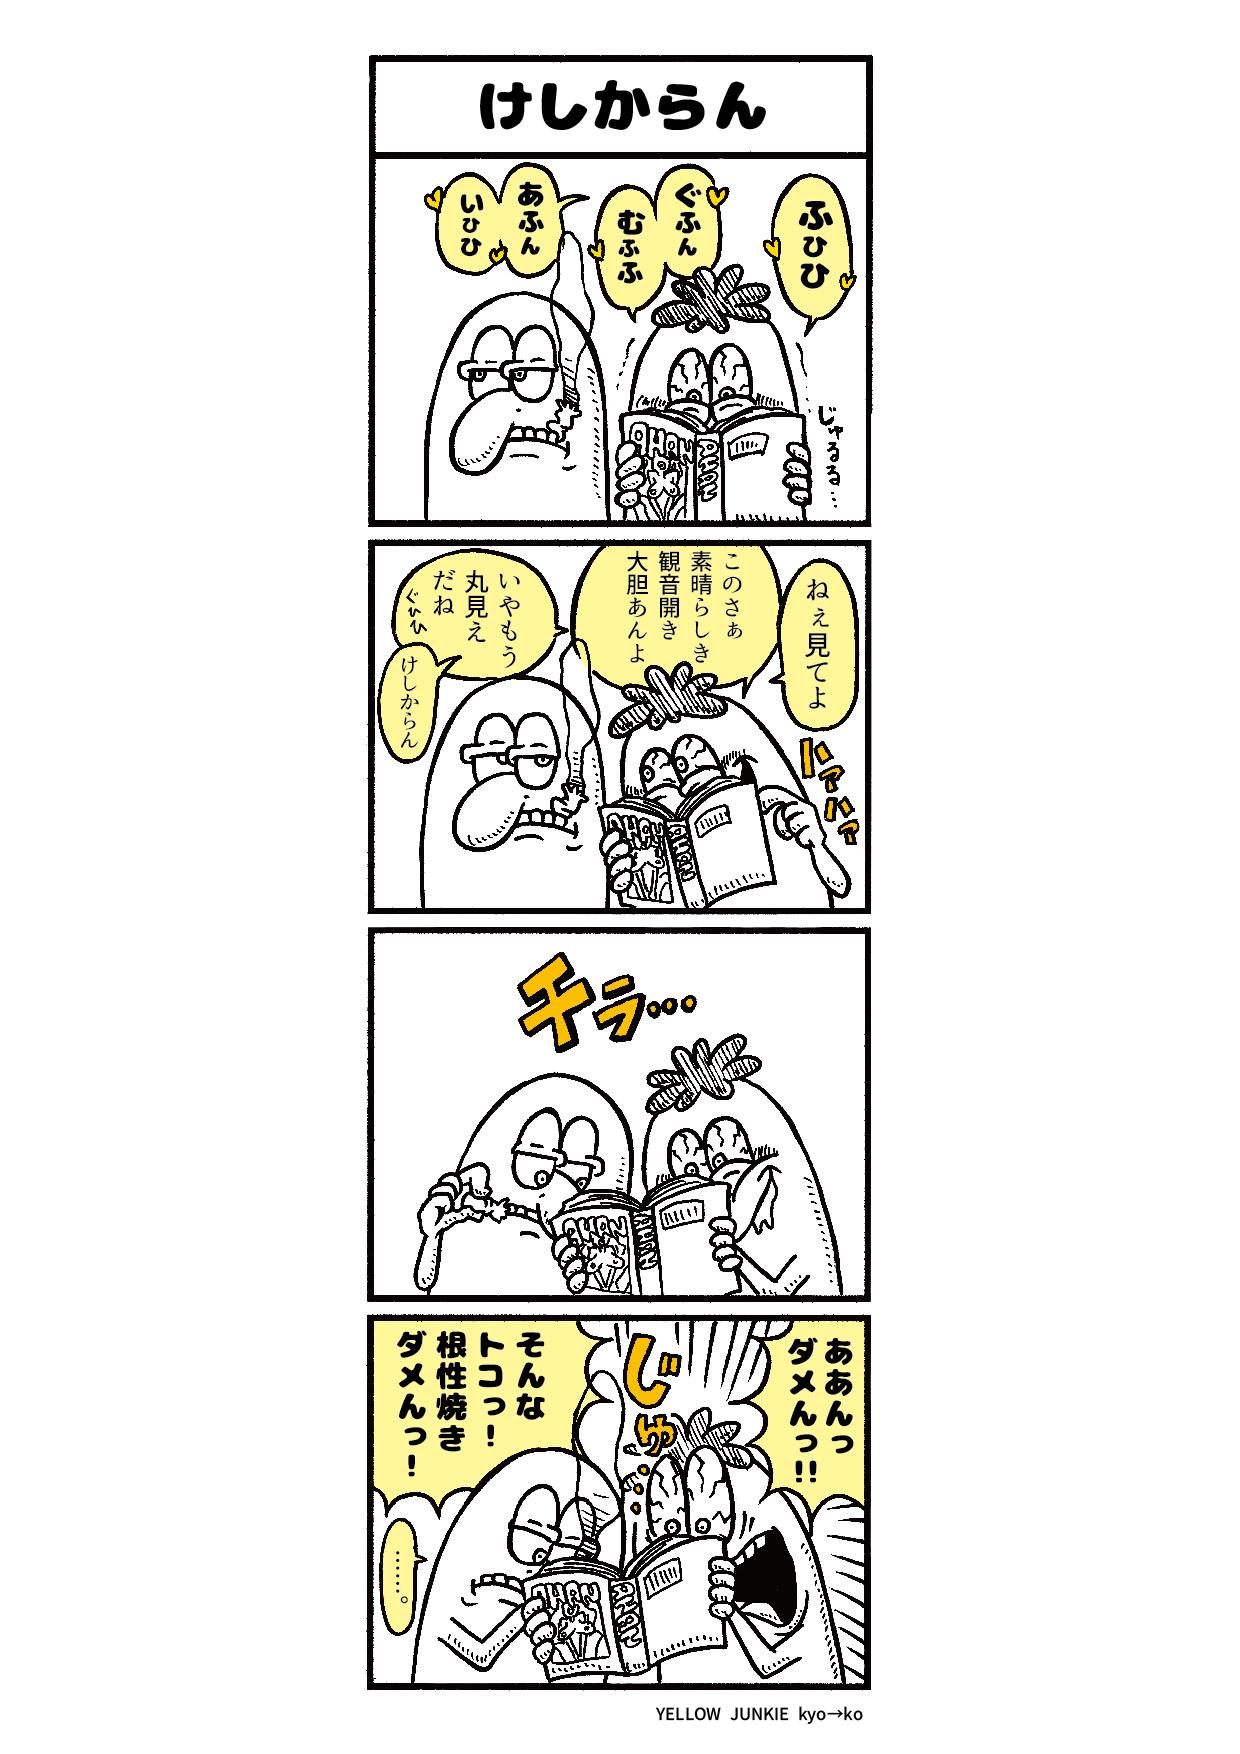 YELLOW JUNKIE「5話:けしからん」